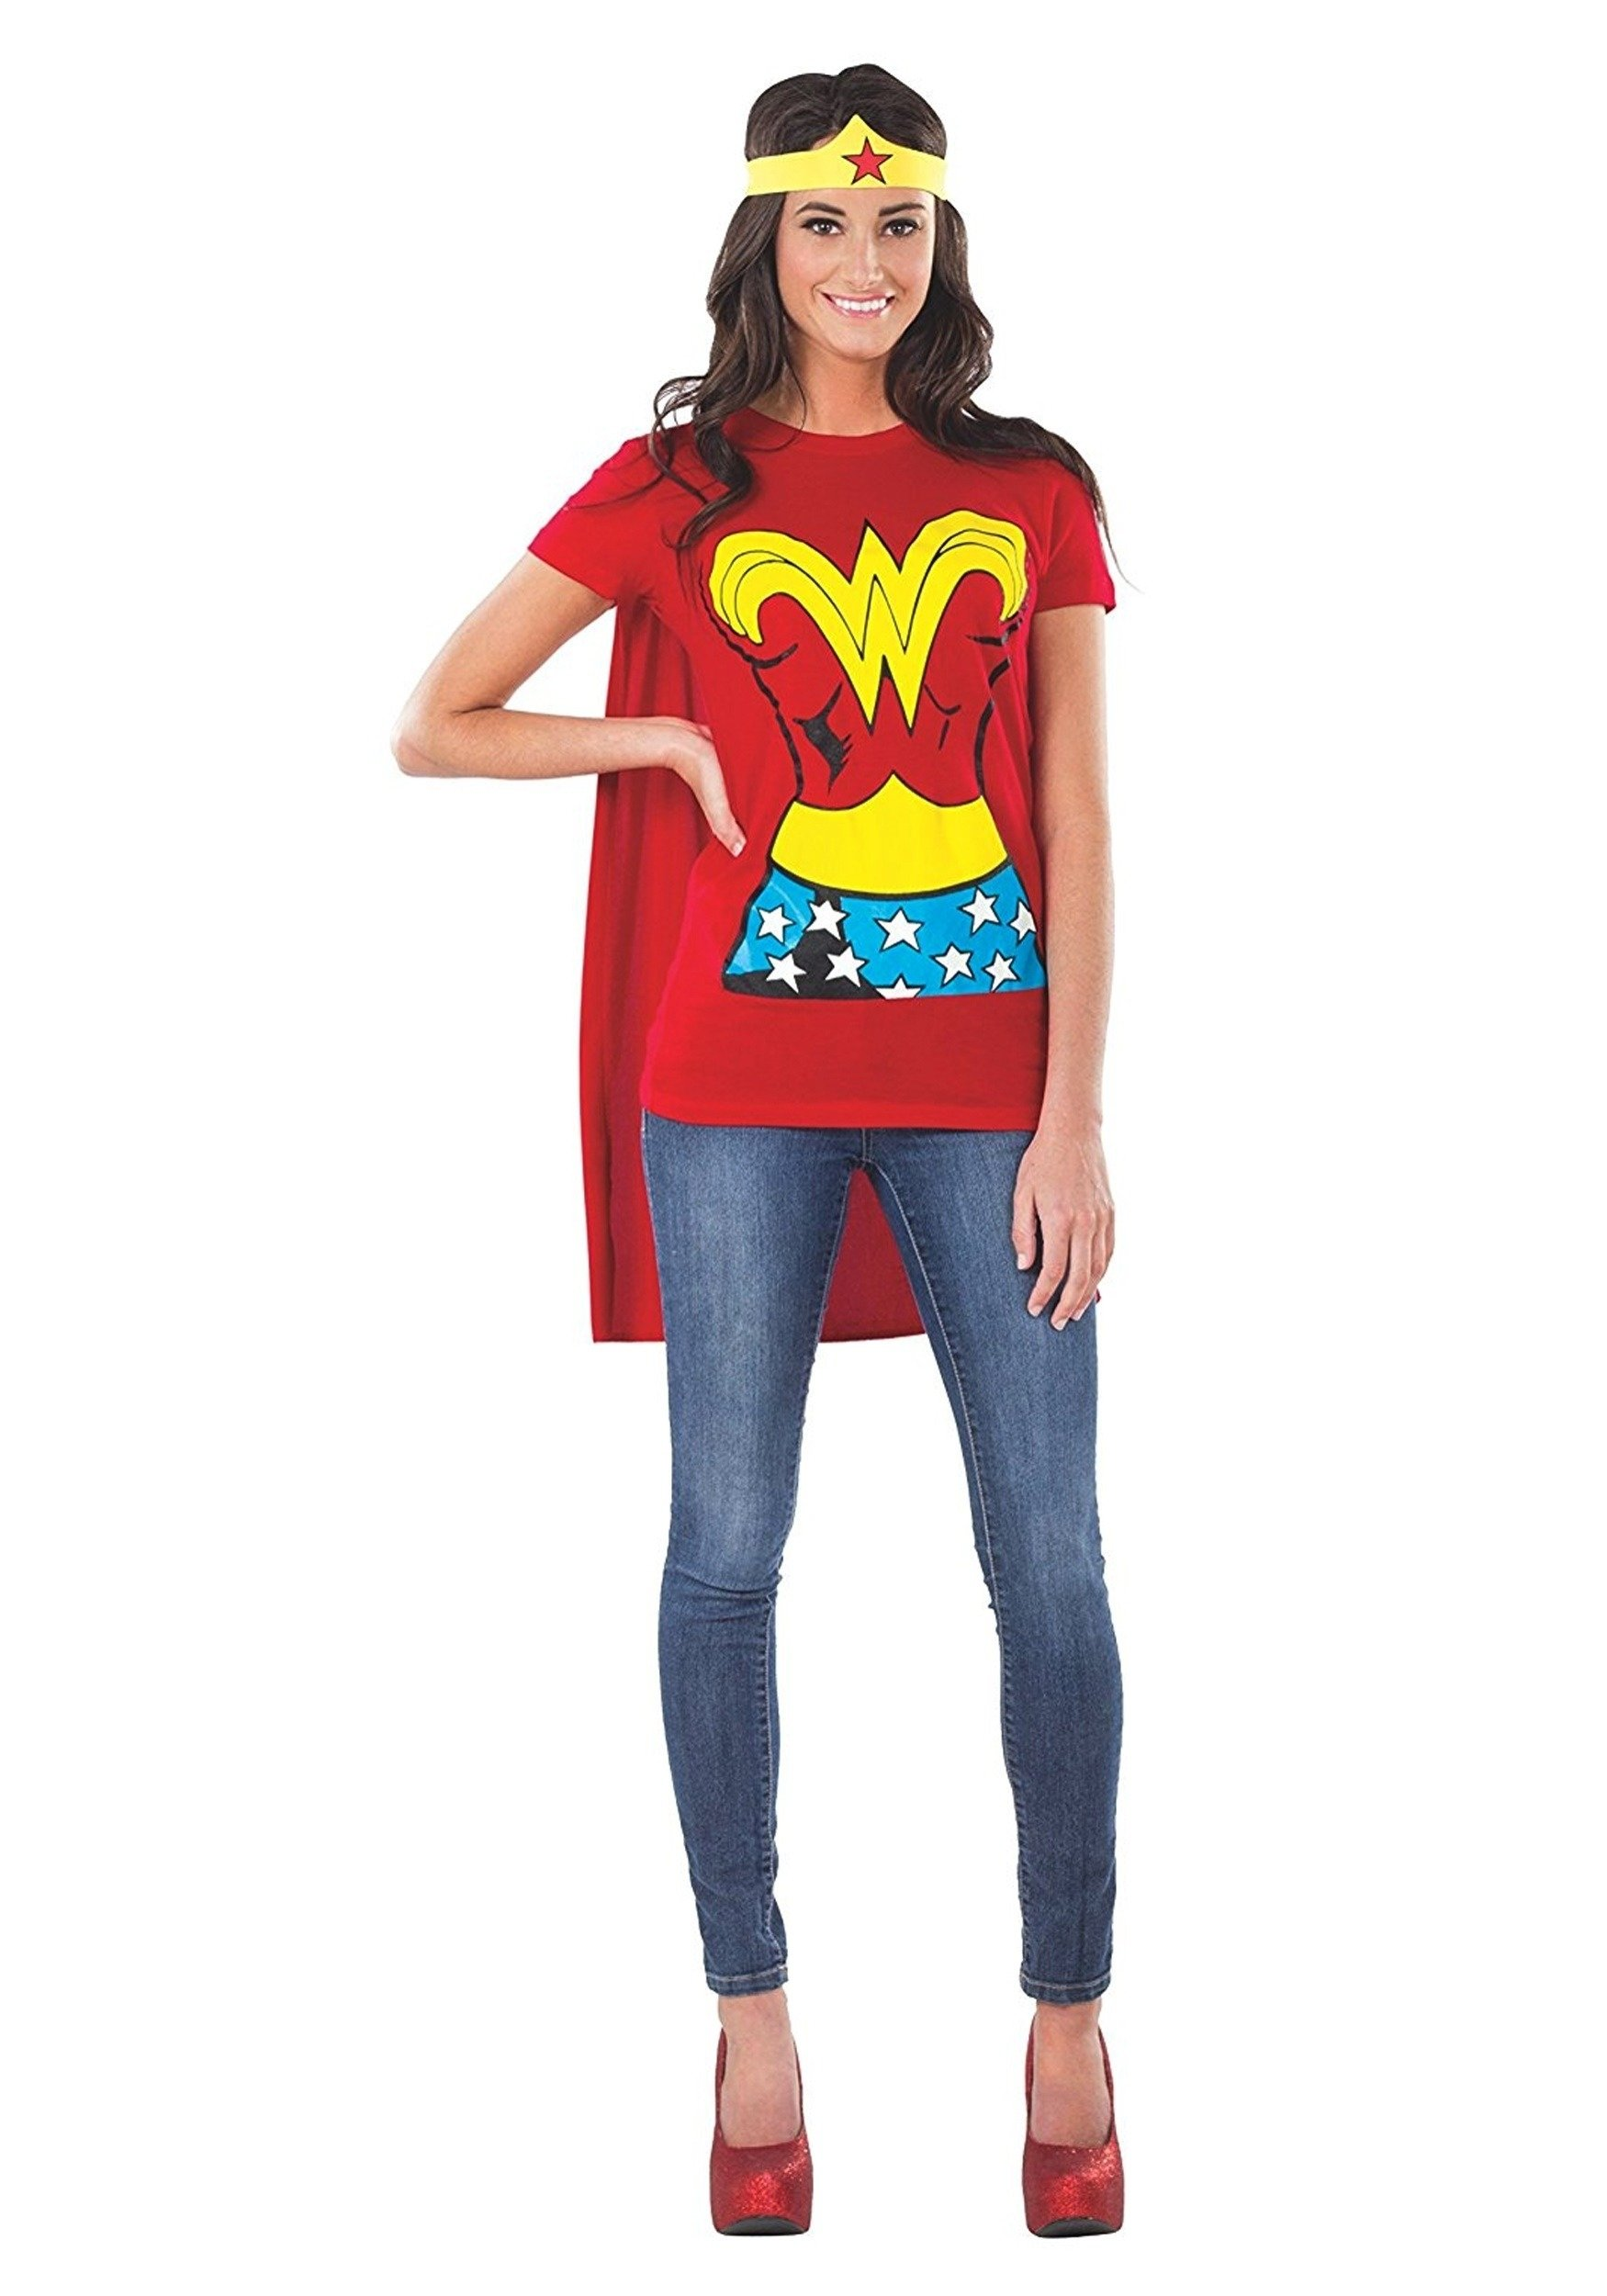 10 Stylish Superhero Costume Ideas For Women superhero wonder woman t shirt costume womens superhero costume ideas 2020